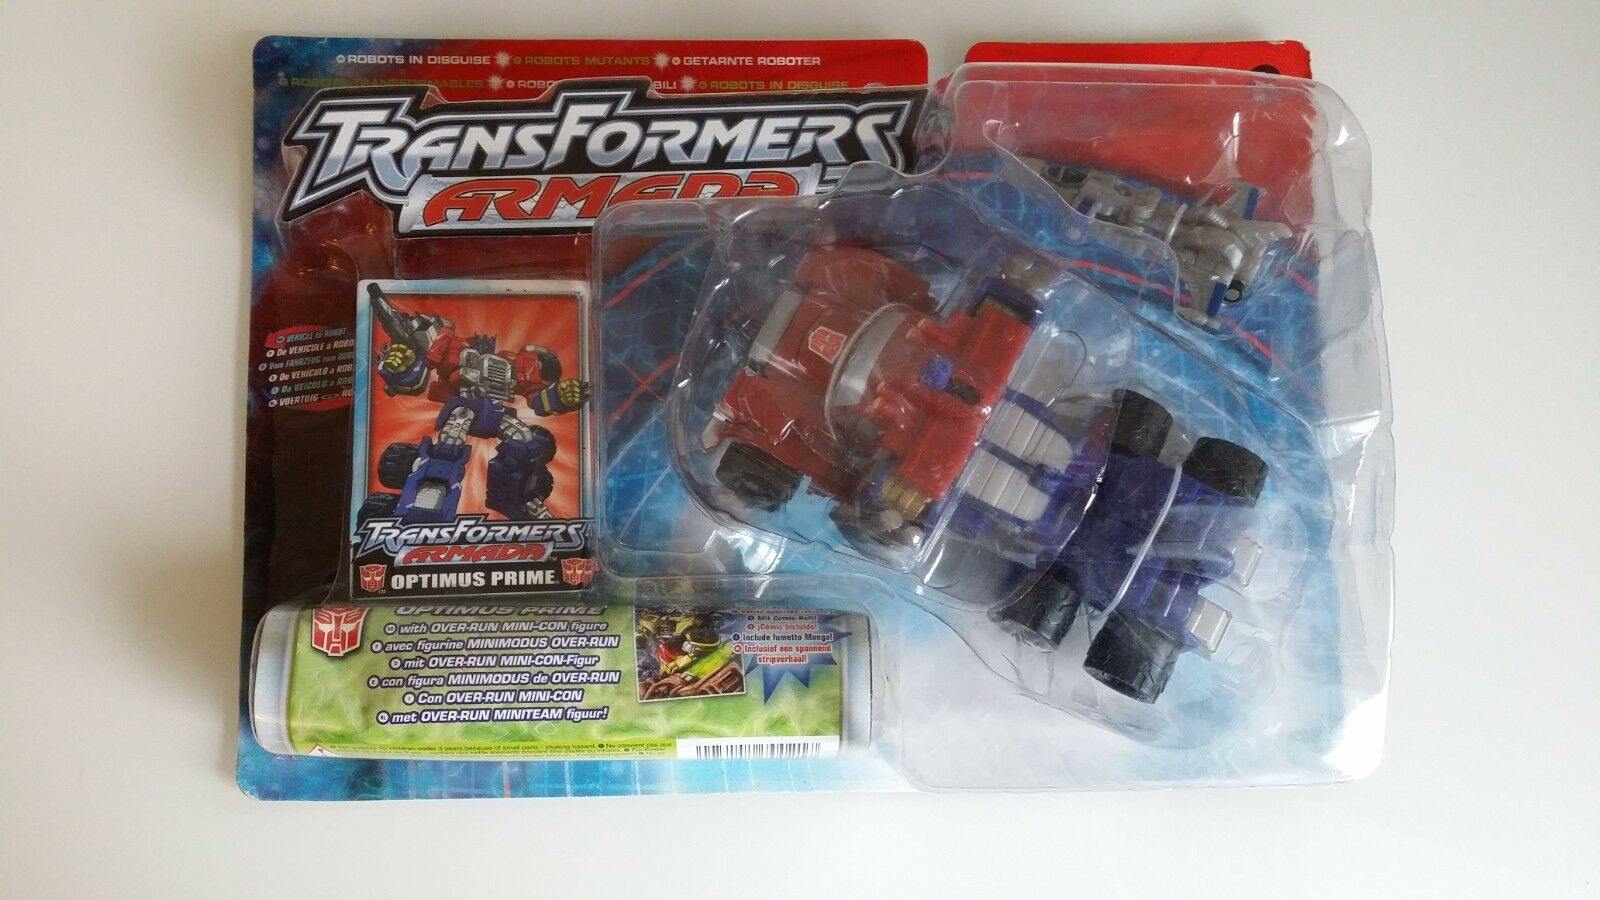 Transformers Armada Optimus Prime With Over-Run Mini-Con Figure Sealed on Card